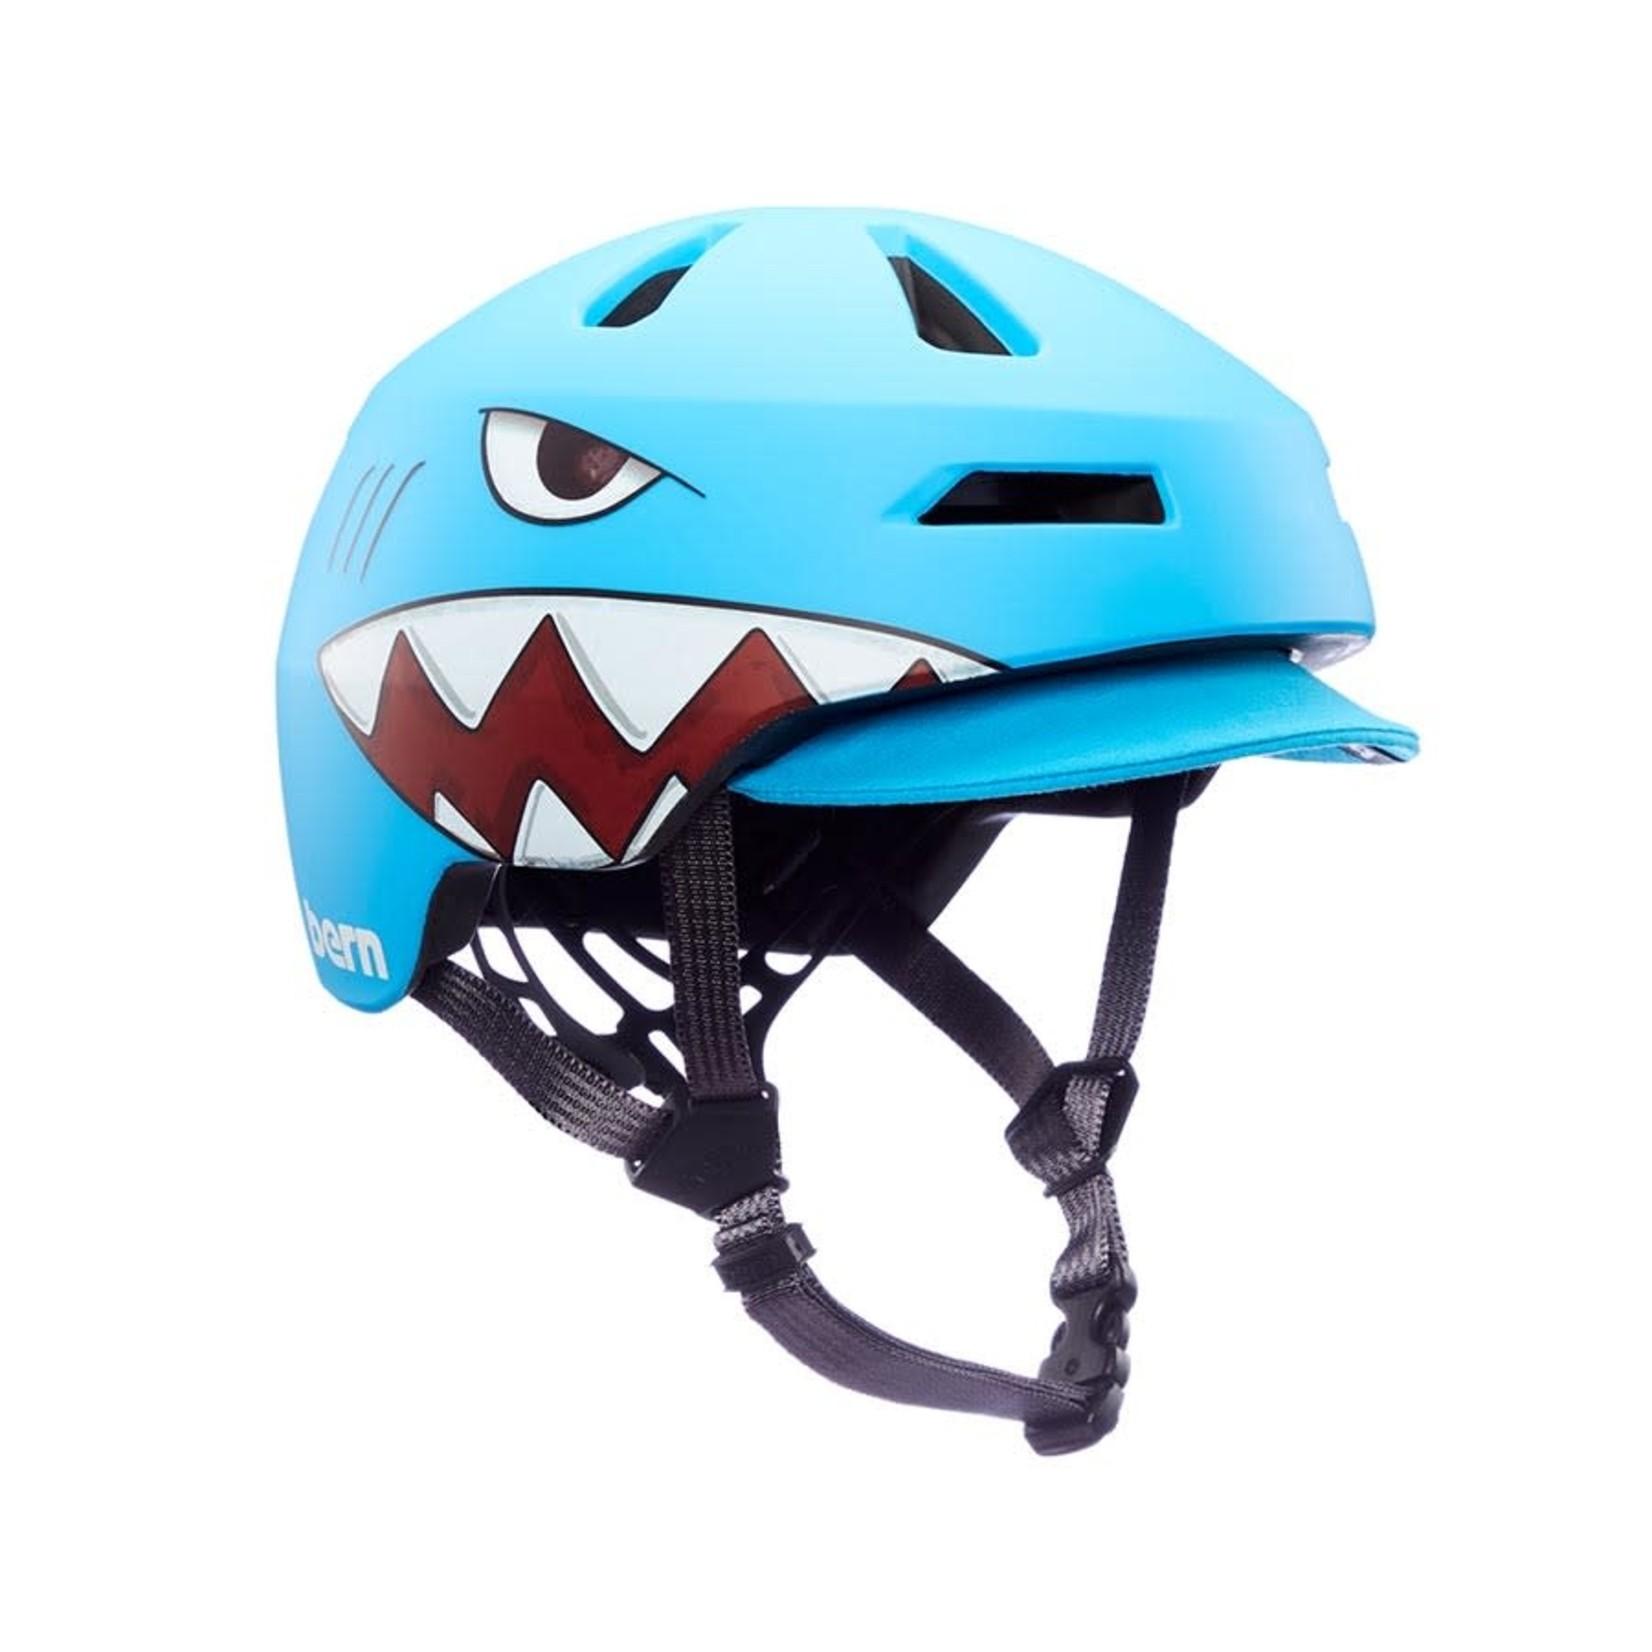 Bern, Nino 2.0 MIPS, Helmet